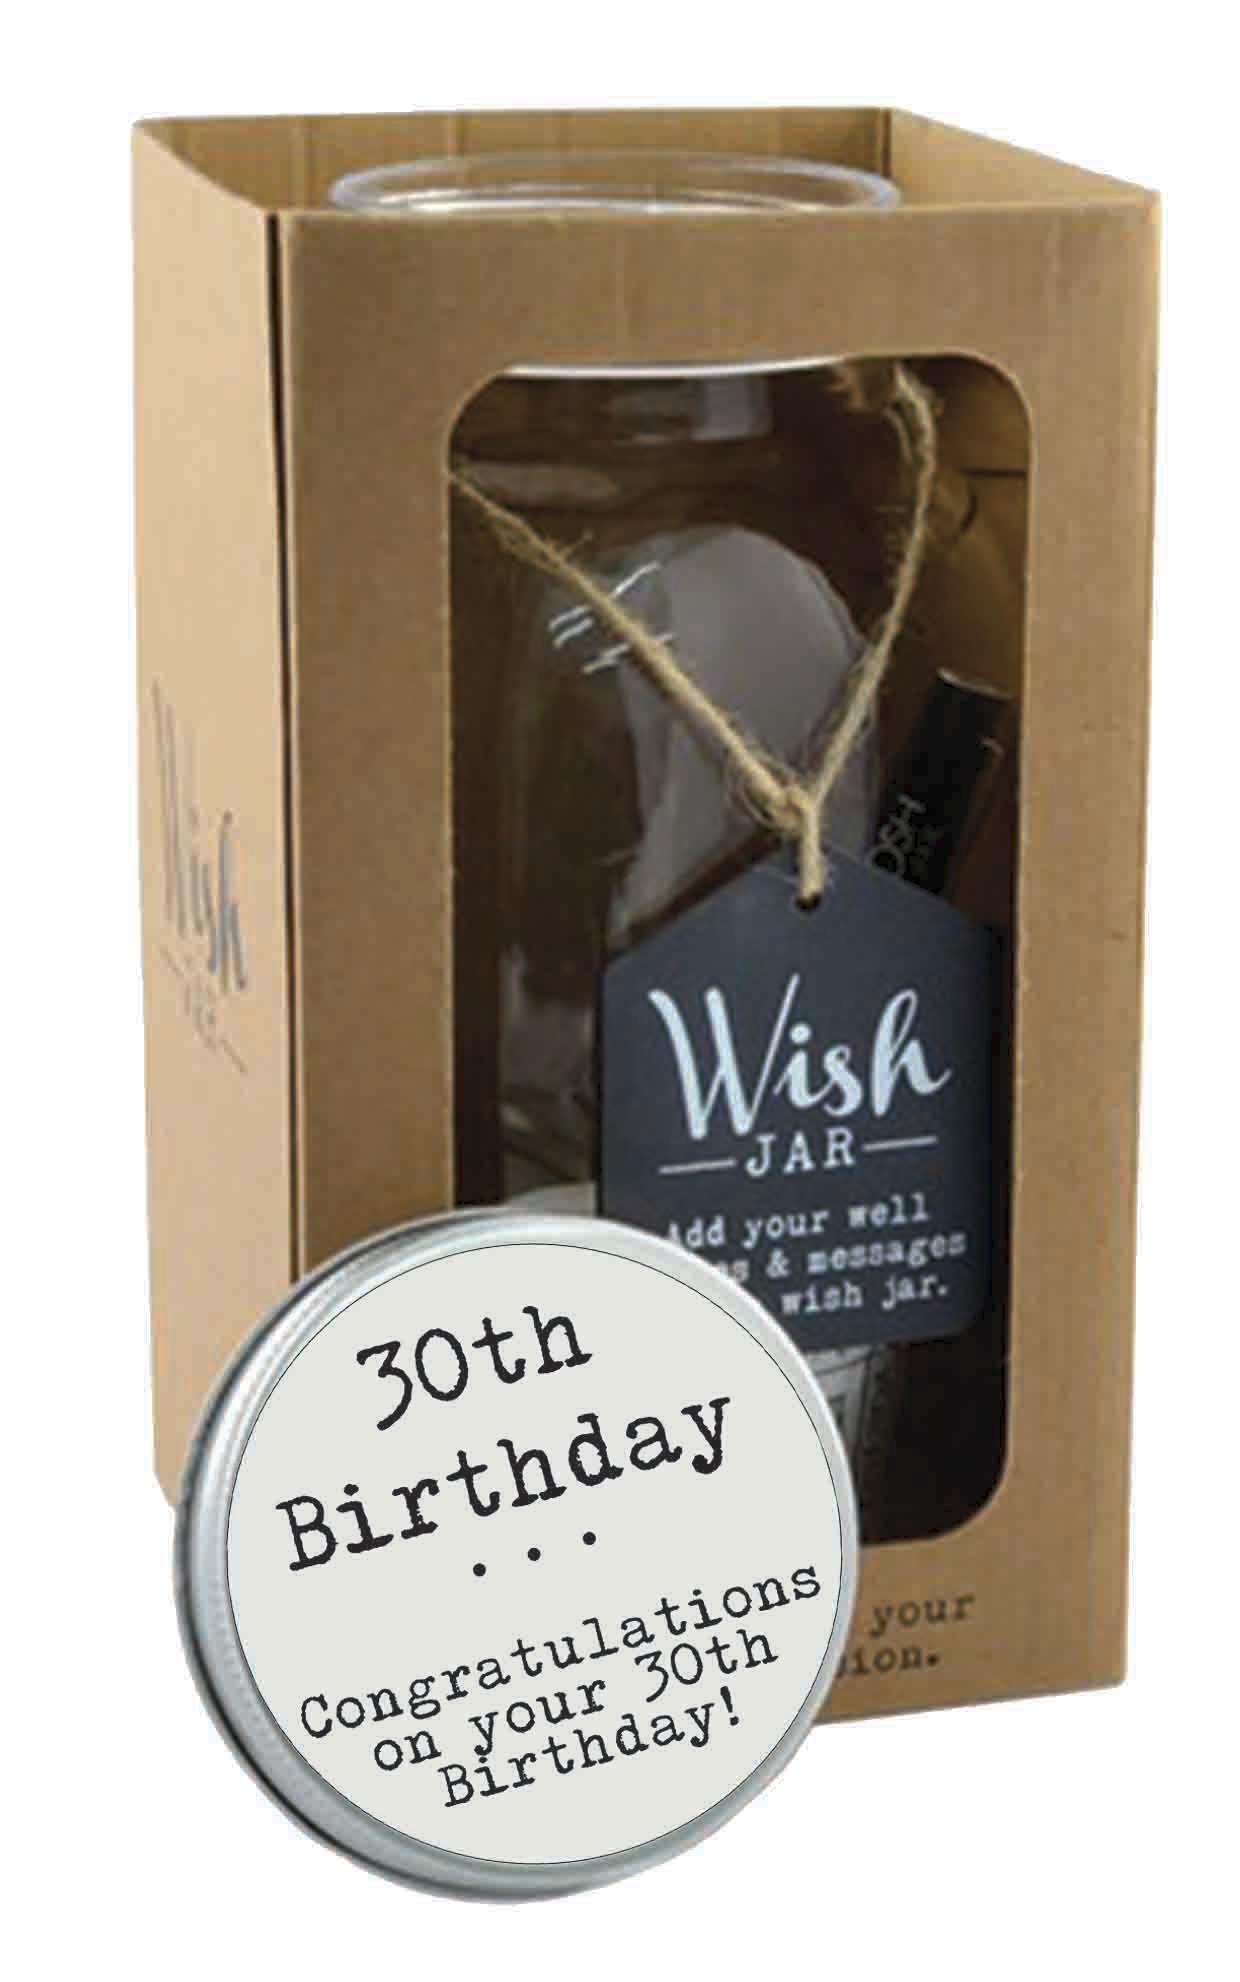 Splosh 30th Birthday Wish Jar Gift Idea Gifts Love Kates